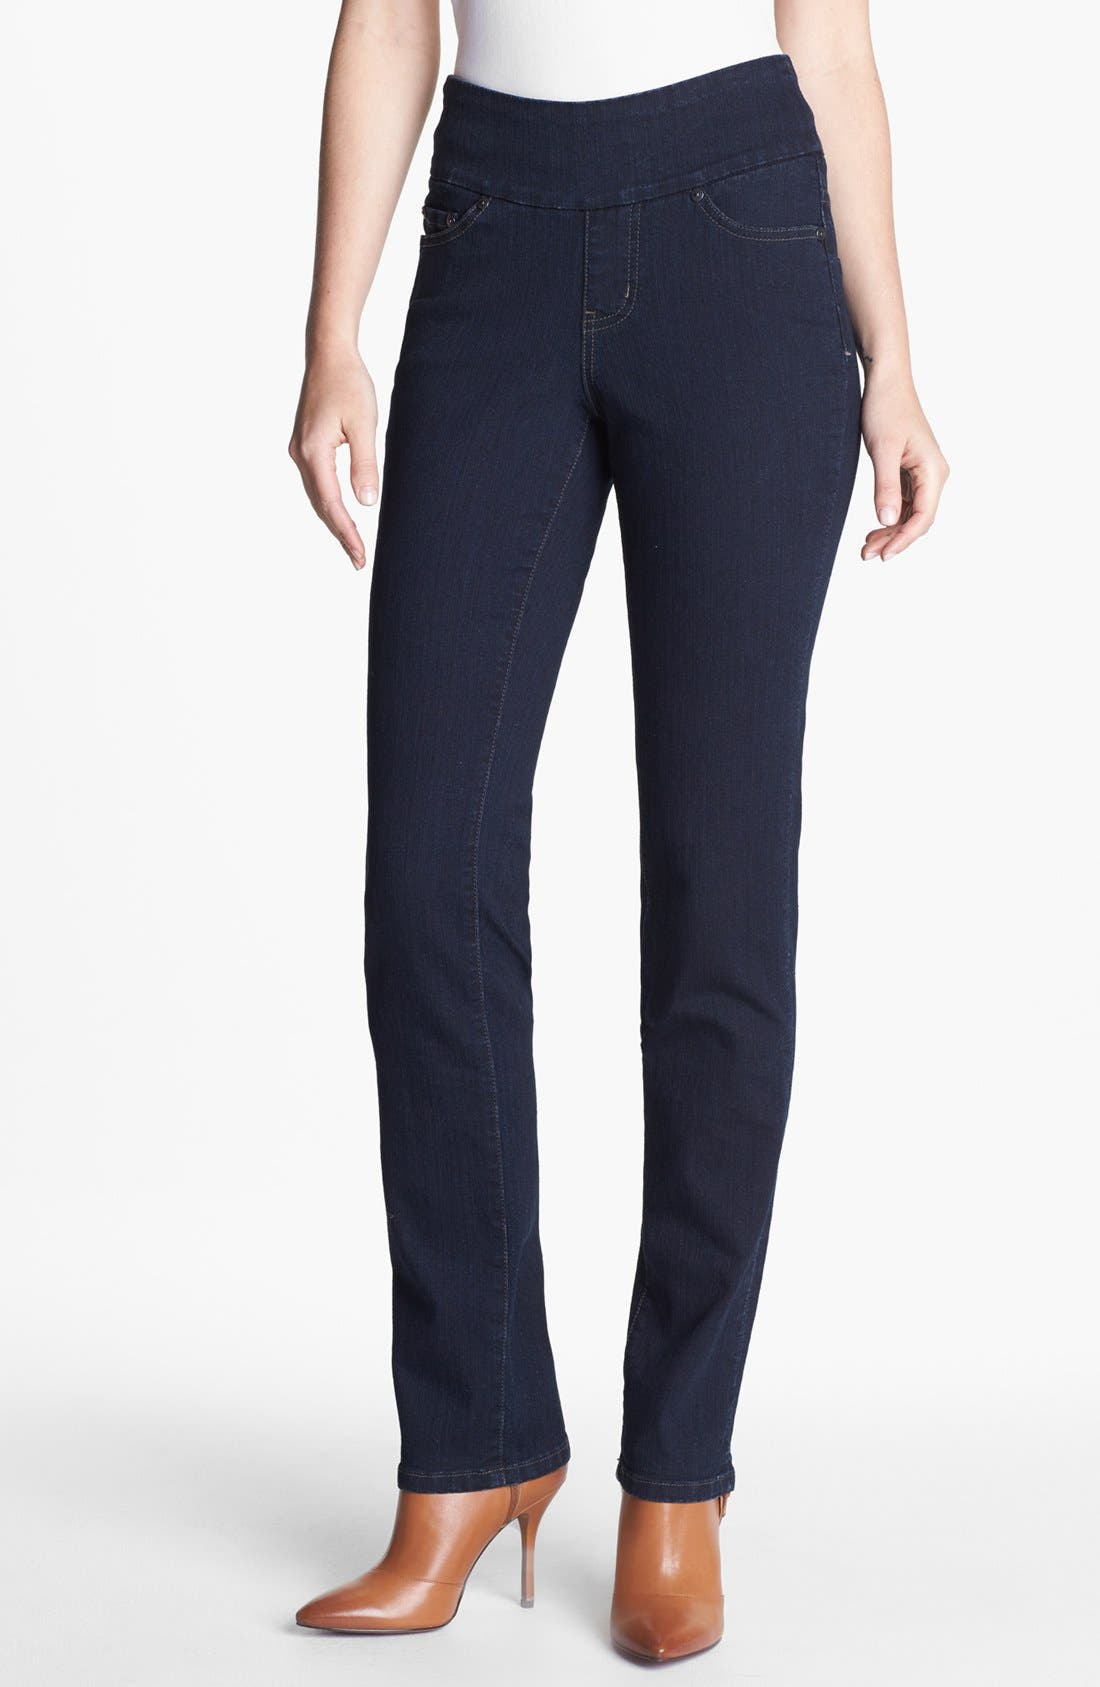 Alternate Image 1 Selected - Jag Jeans 'Peri' Straight Leg Jeans